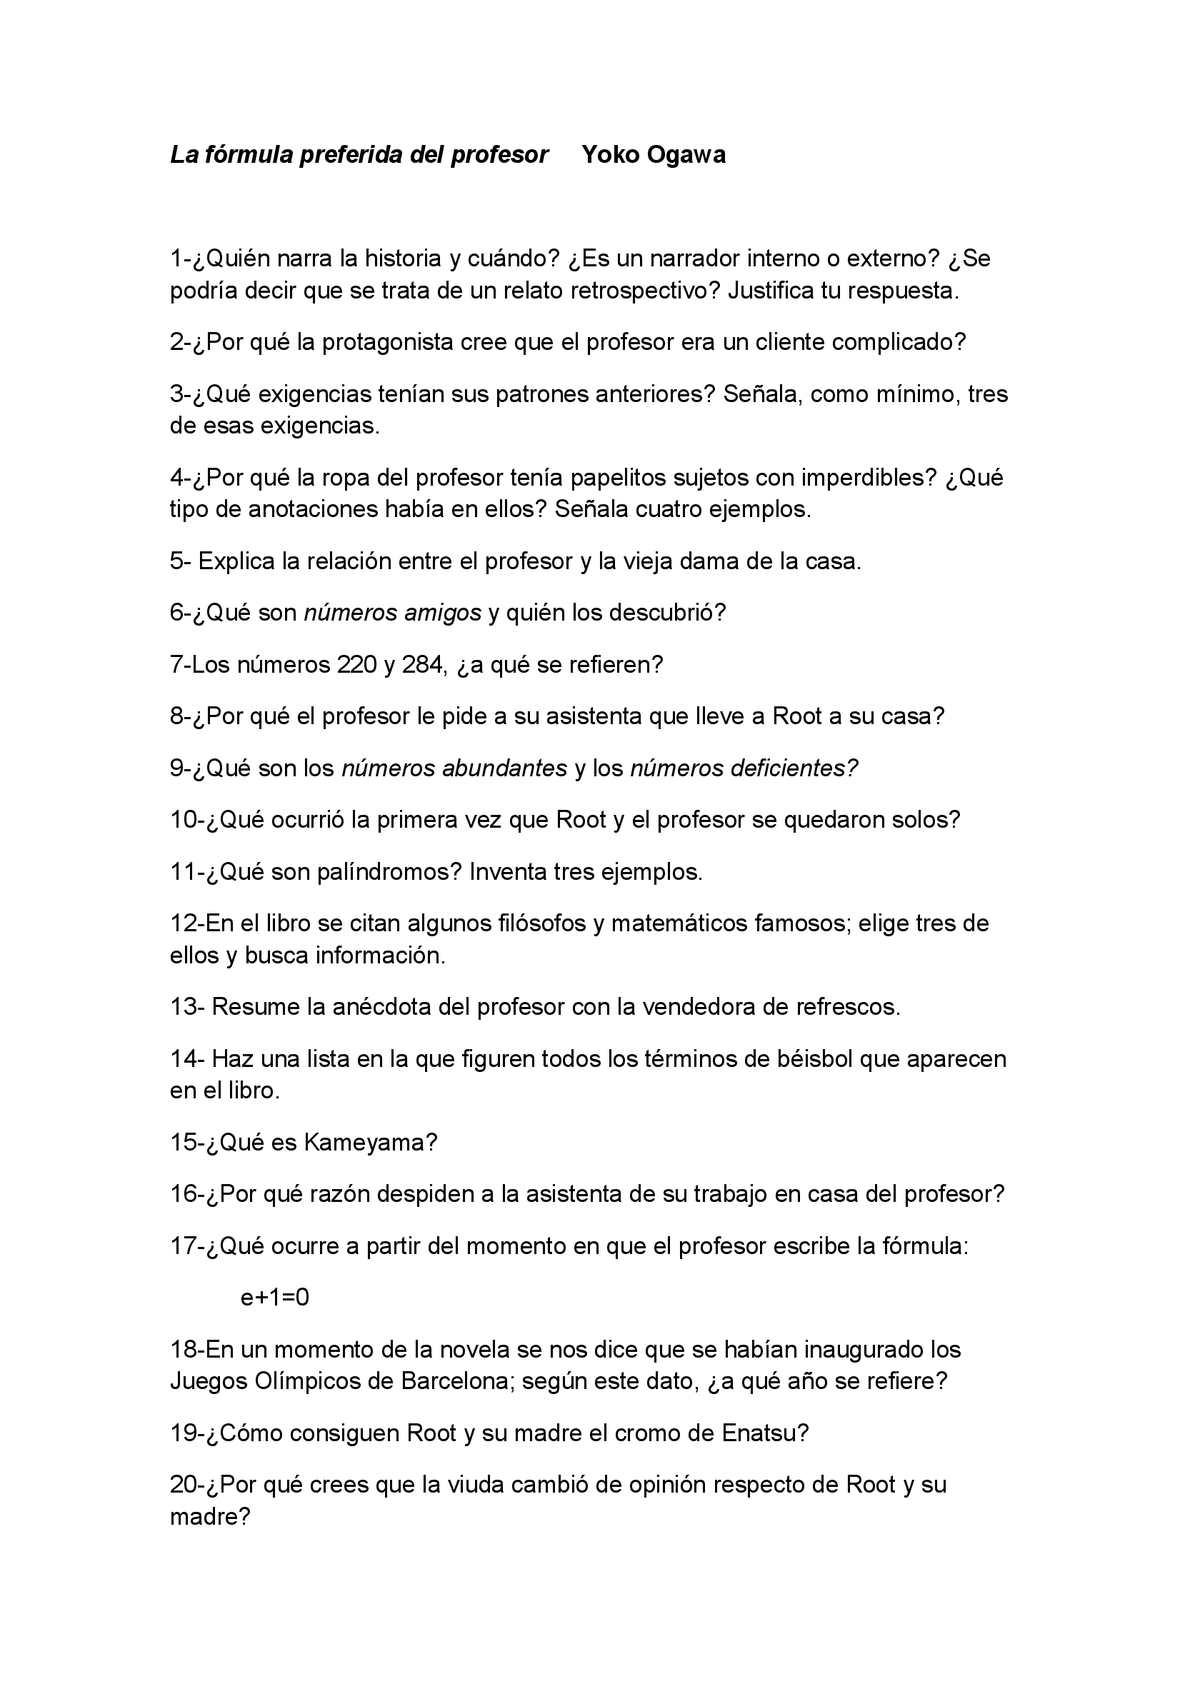 Calaméo - Actividades sobre La fórmula preferida del profesor (Yoko ...